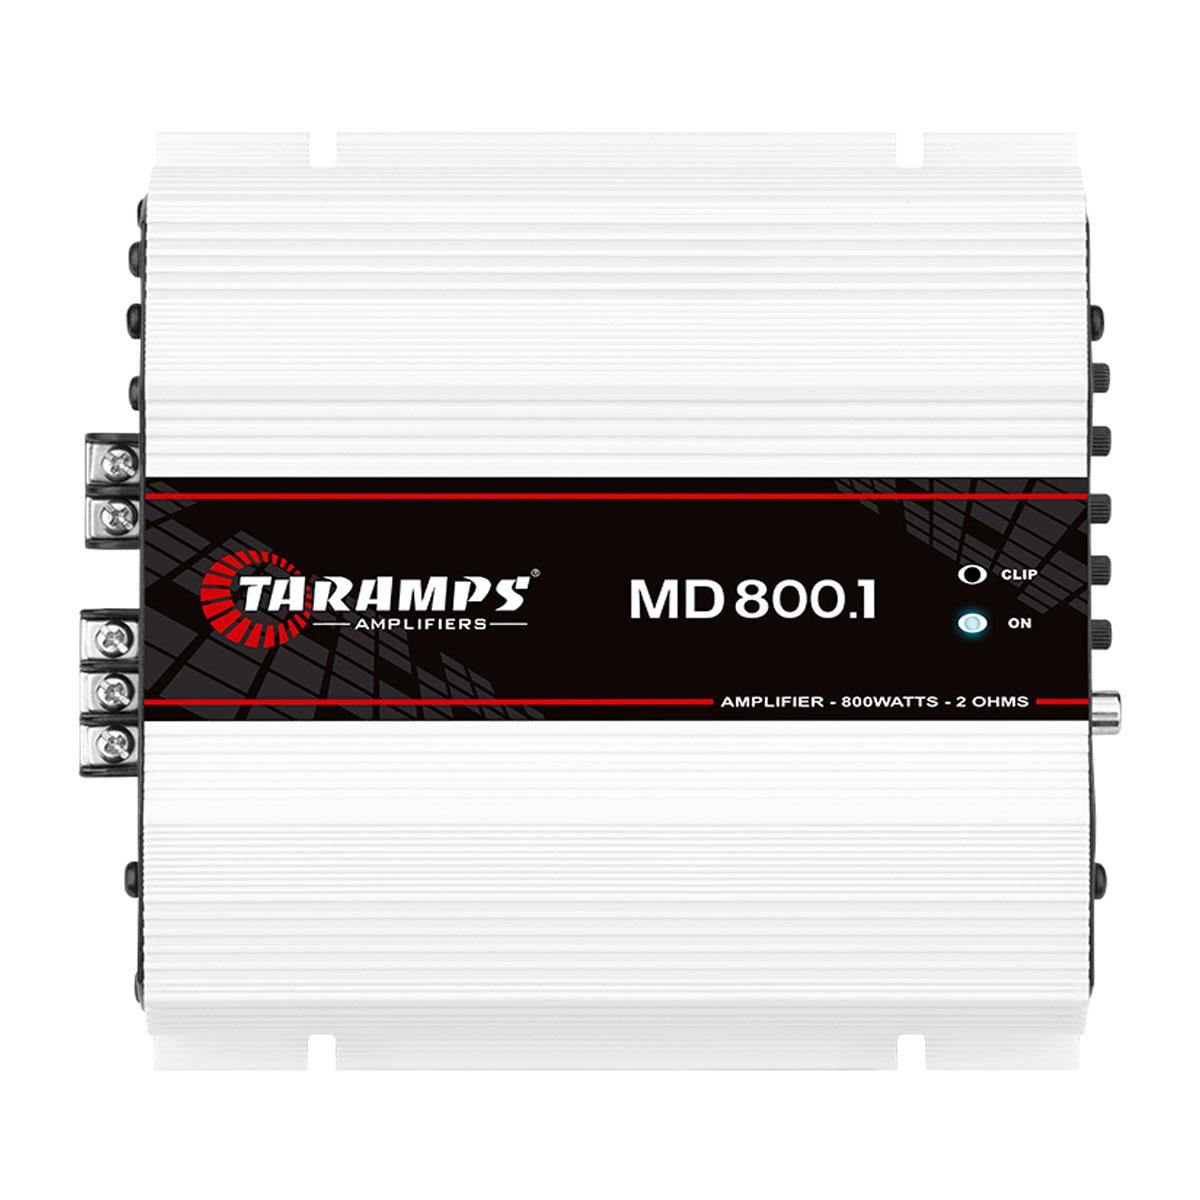 Modulo Amplificador Taramps MD800.1 1 Canal de 800wrms 2Ohms